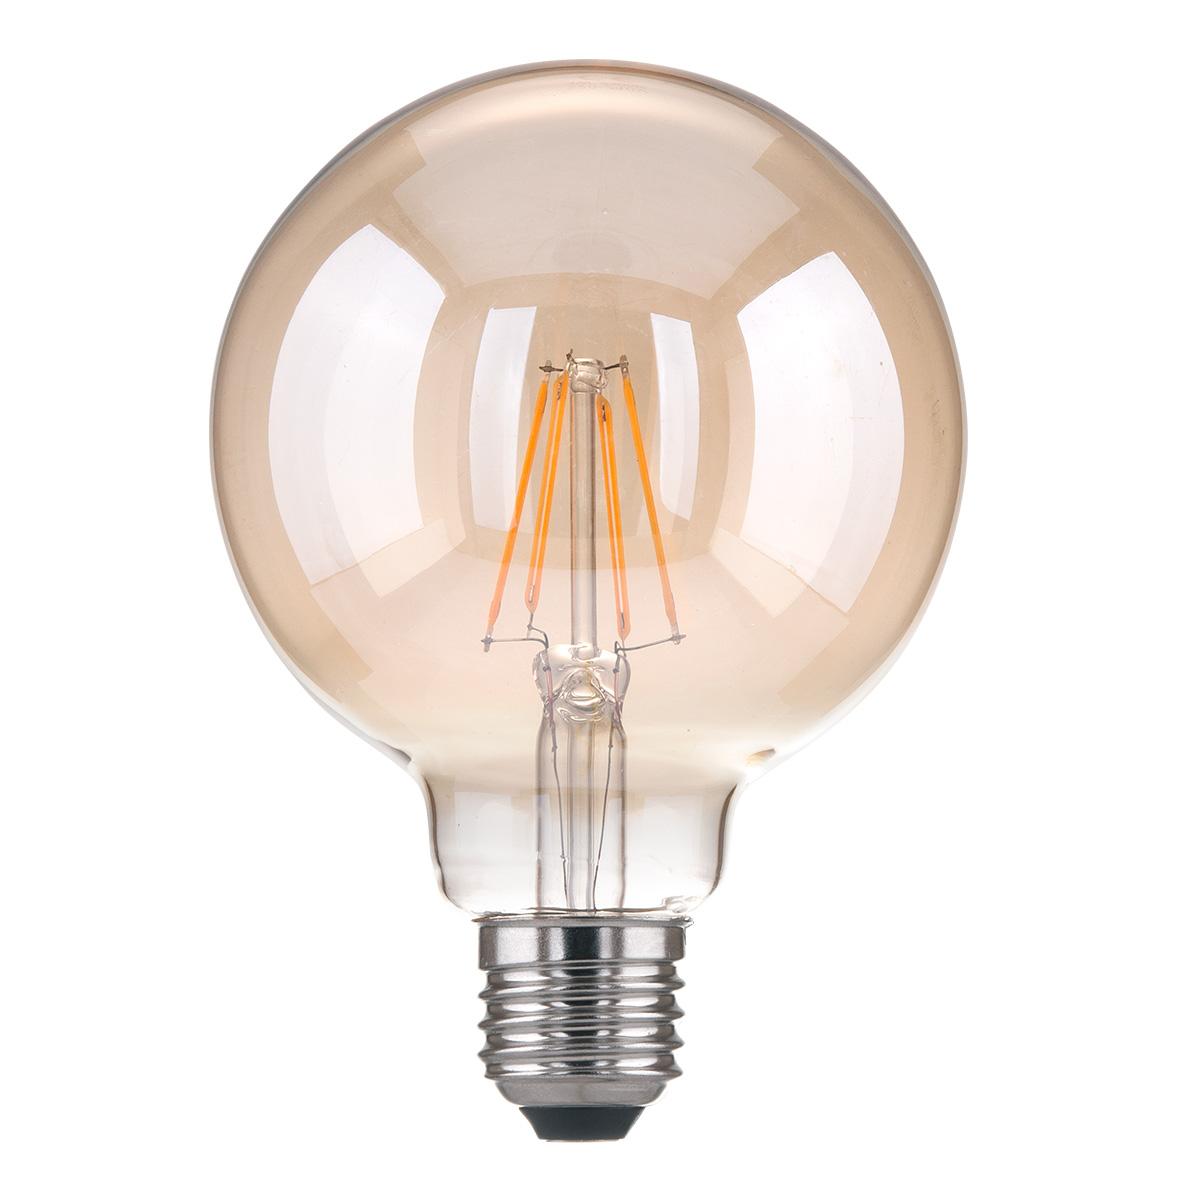 Лампа LED - Classic F 6W 3300K E27 (G95 тонированный)